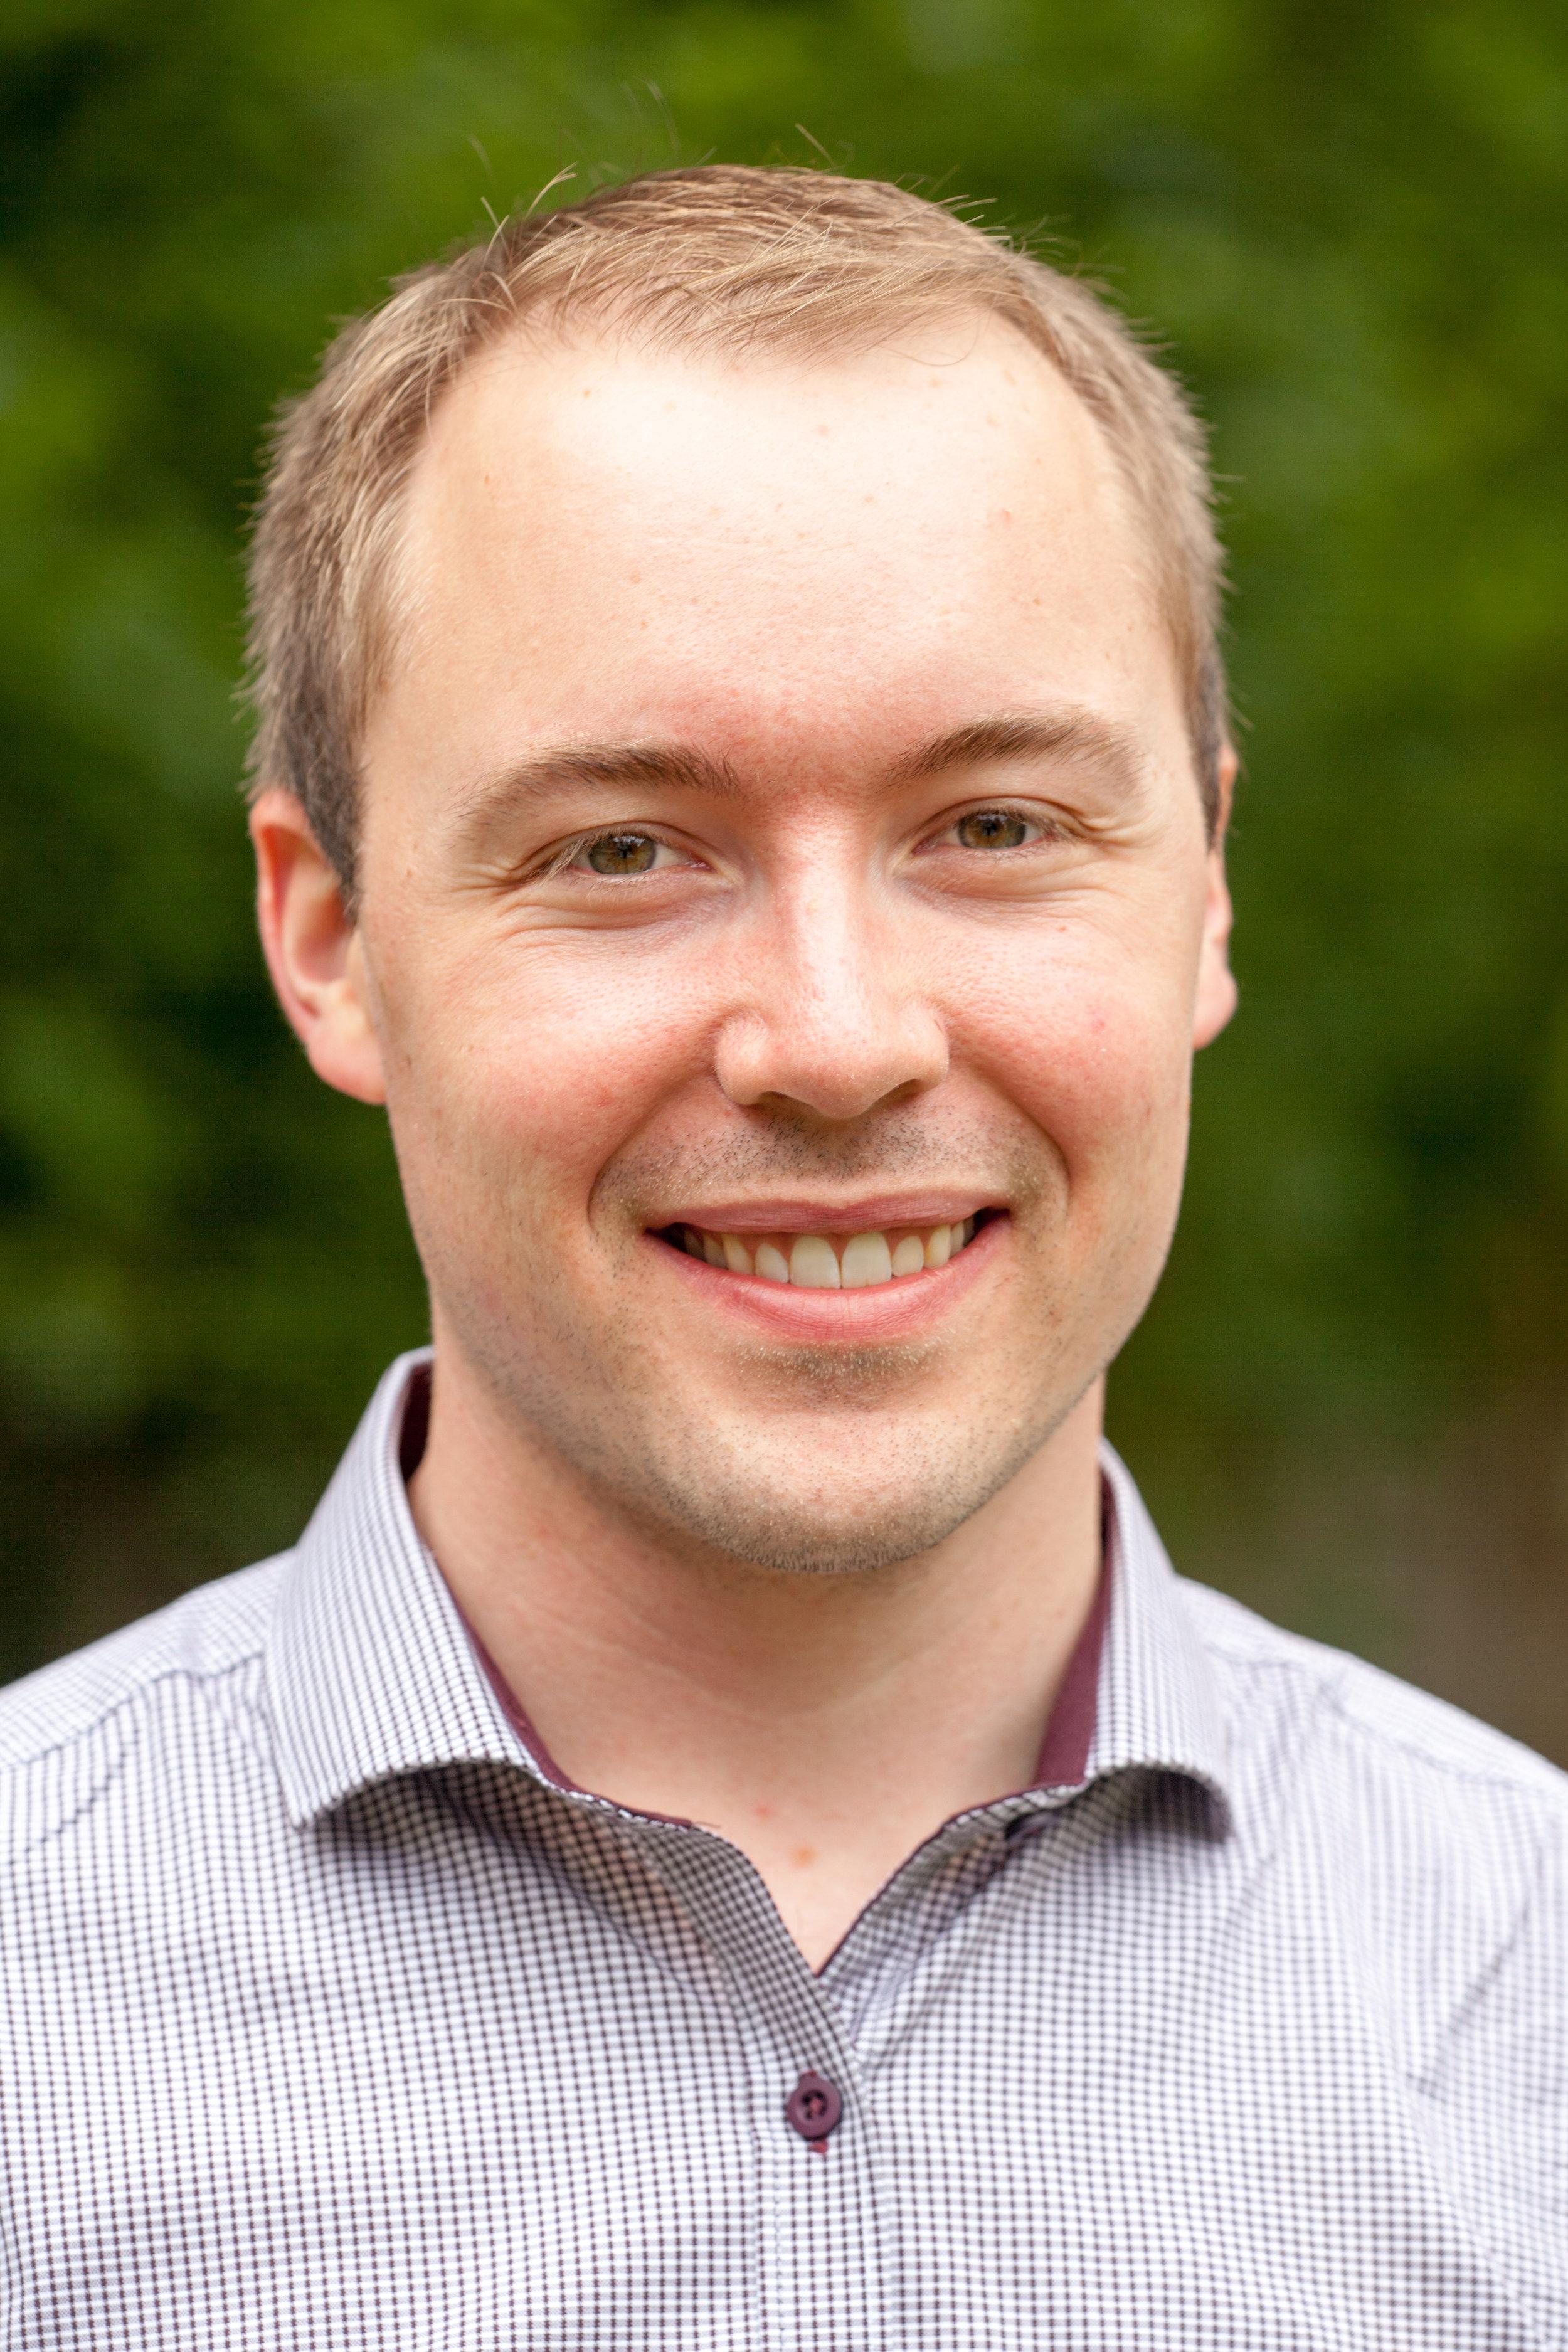 Nick Burton - Centre for Trophoblast Research Next Generation Fellow/Hosted ScientistPhD 2017 Massachusetts Institute of Technologynob20@cam.ac.uk@burtonNick